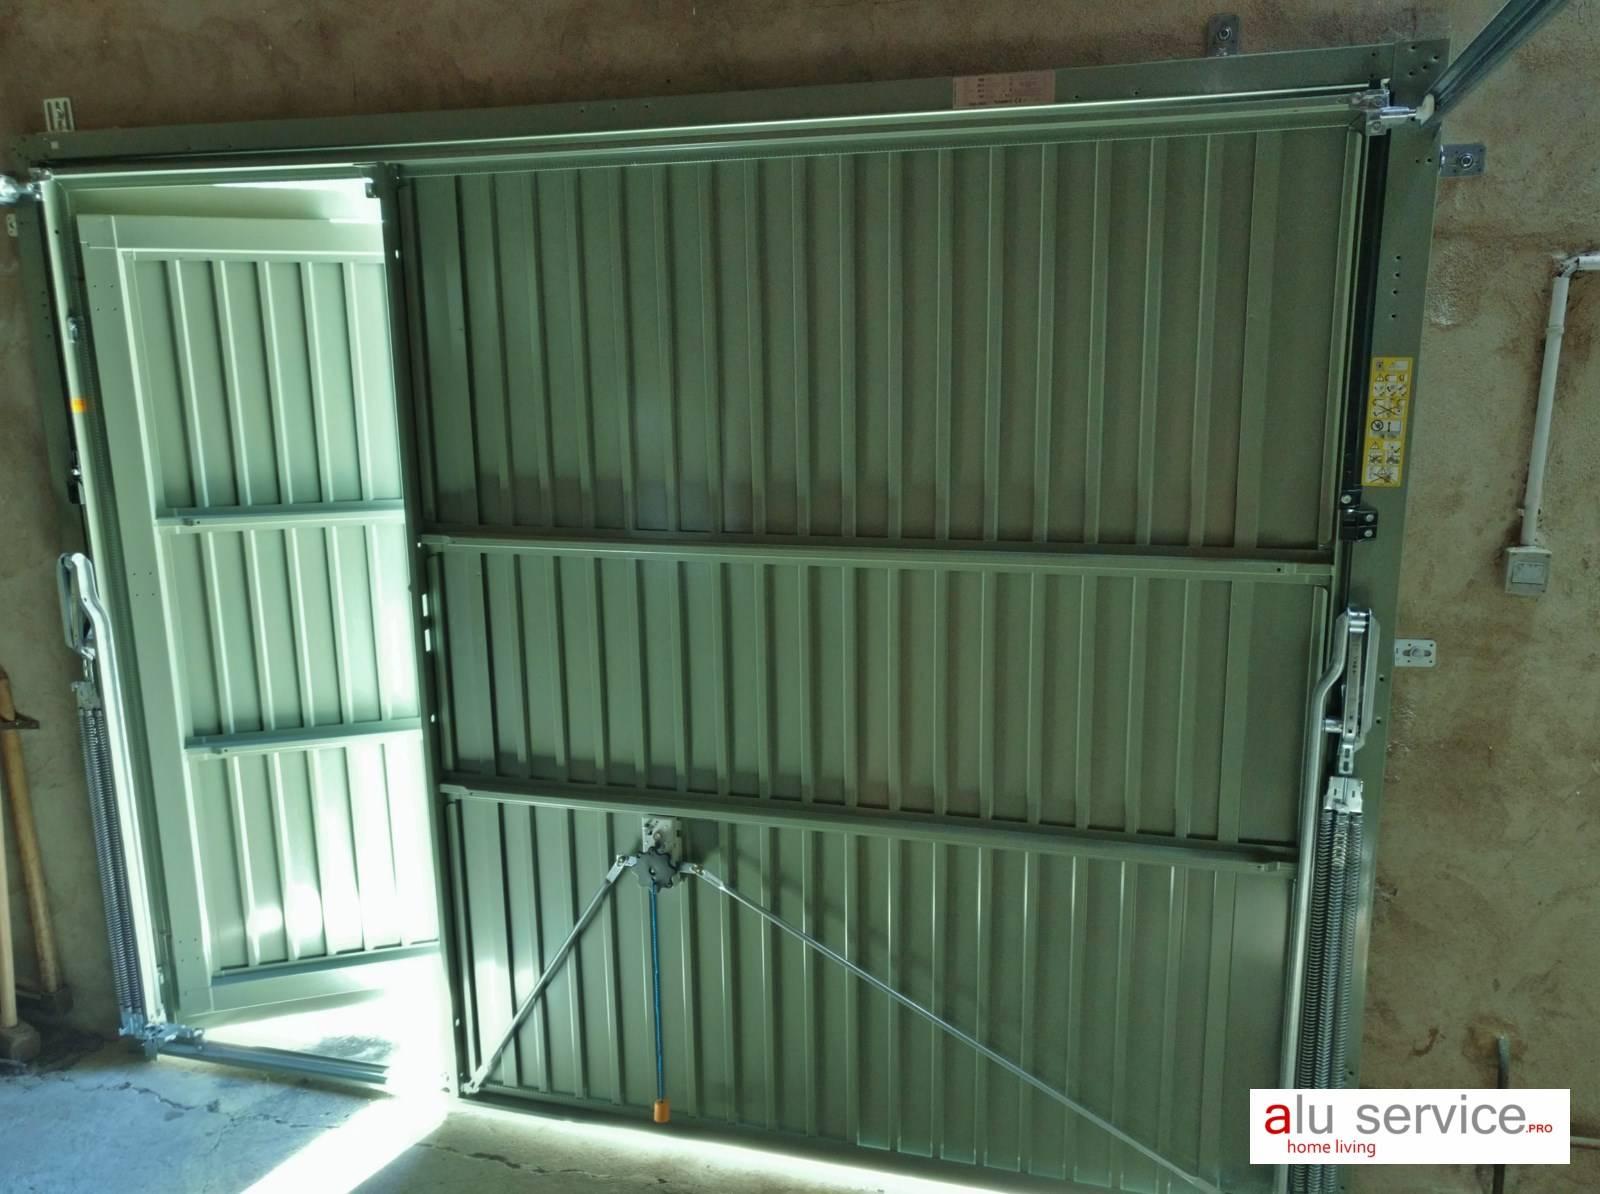 R alisation porte de garage basculante avec portillon for Porte de garage basculante sur mesure avec portillon